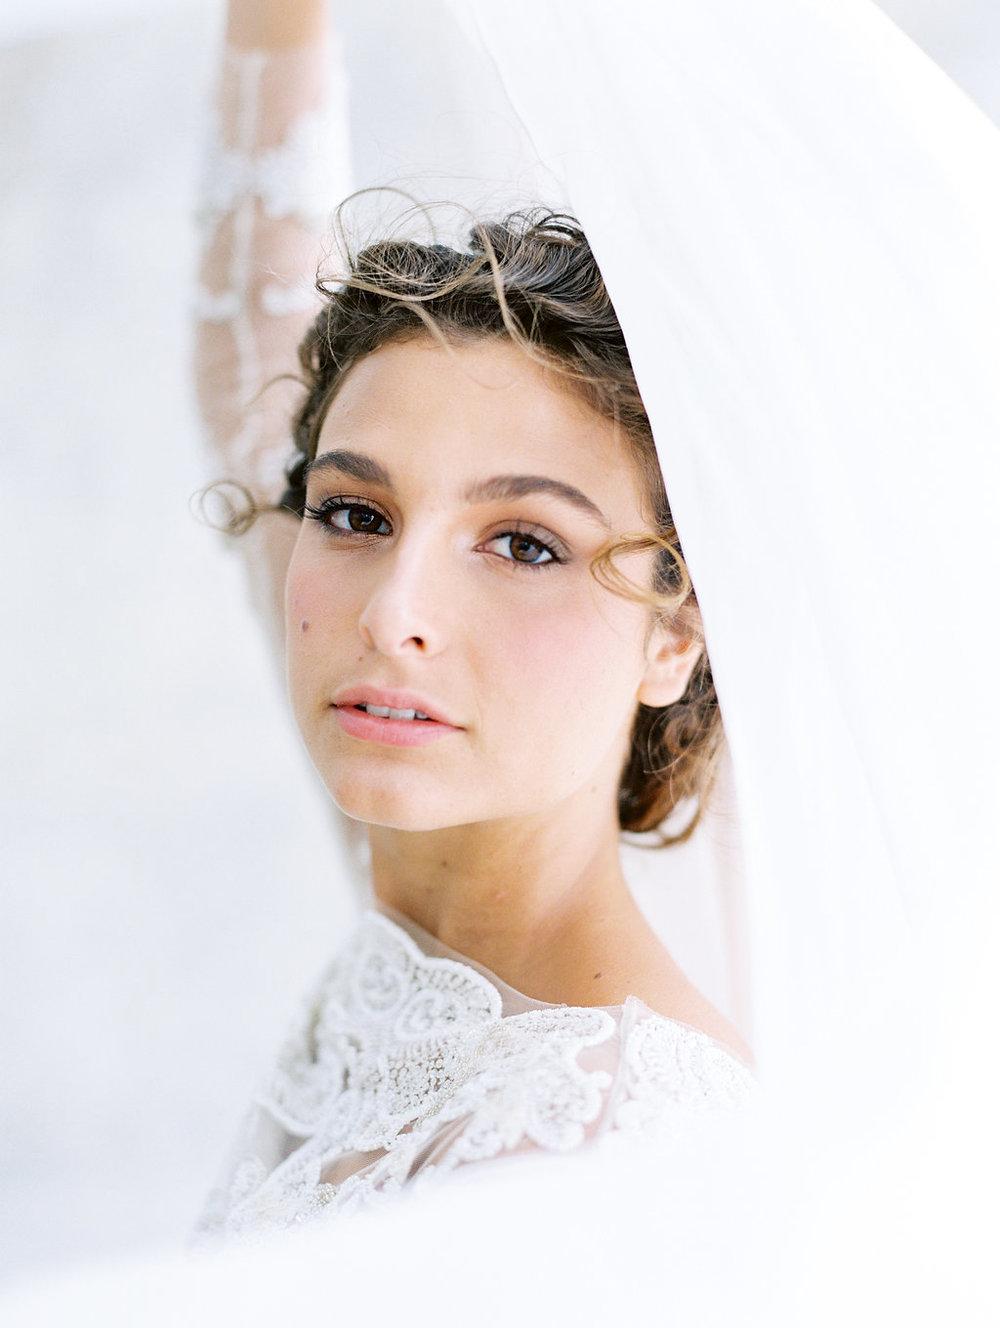 ballet-inspired-bridal-shoot-stylist-sandra-chau-design-jasmine-petterson-1.jpg